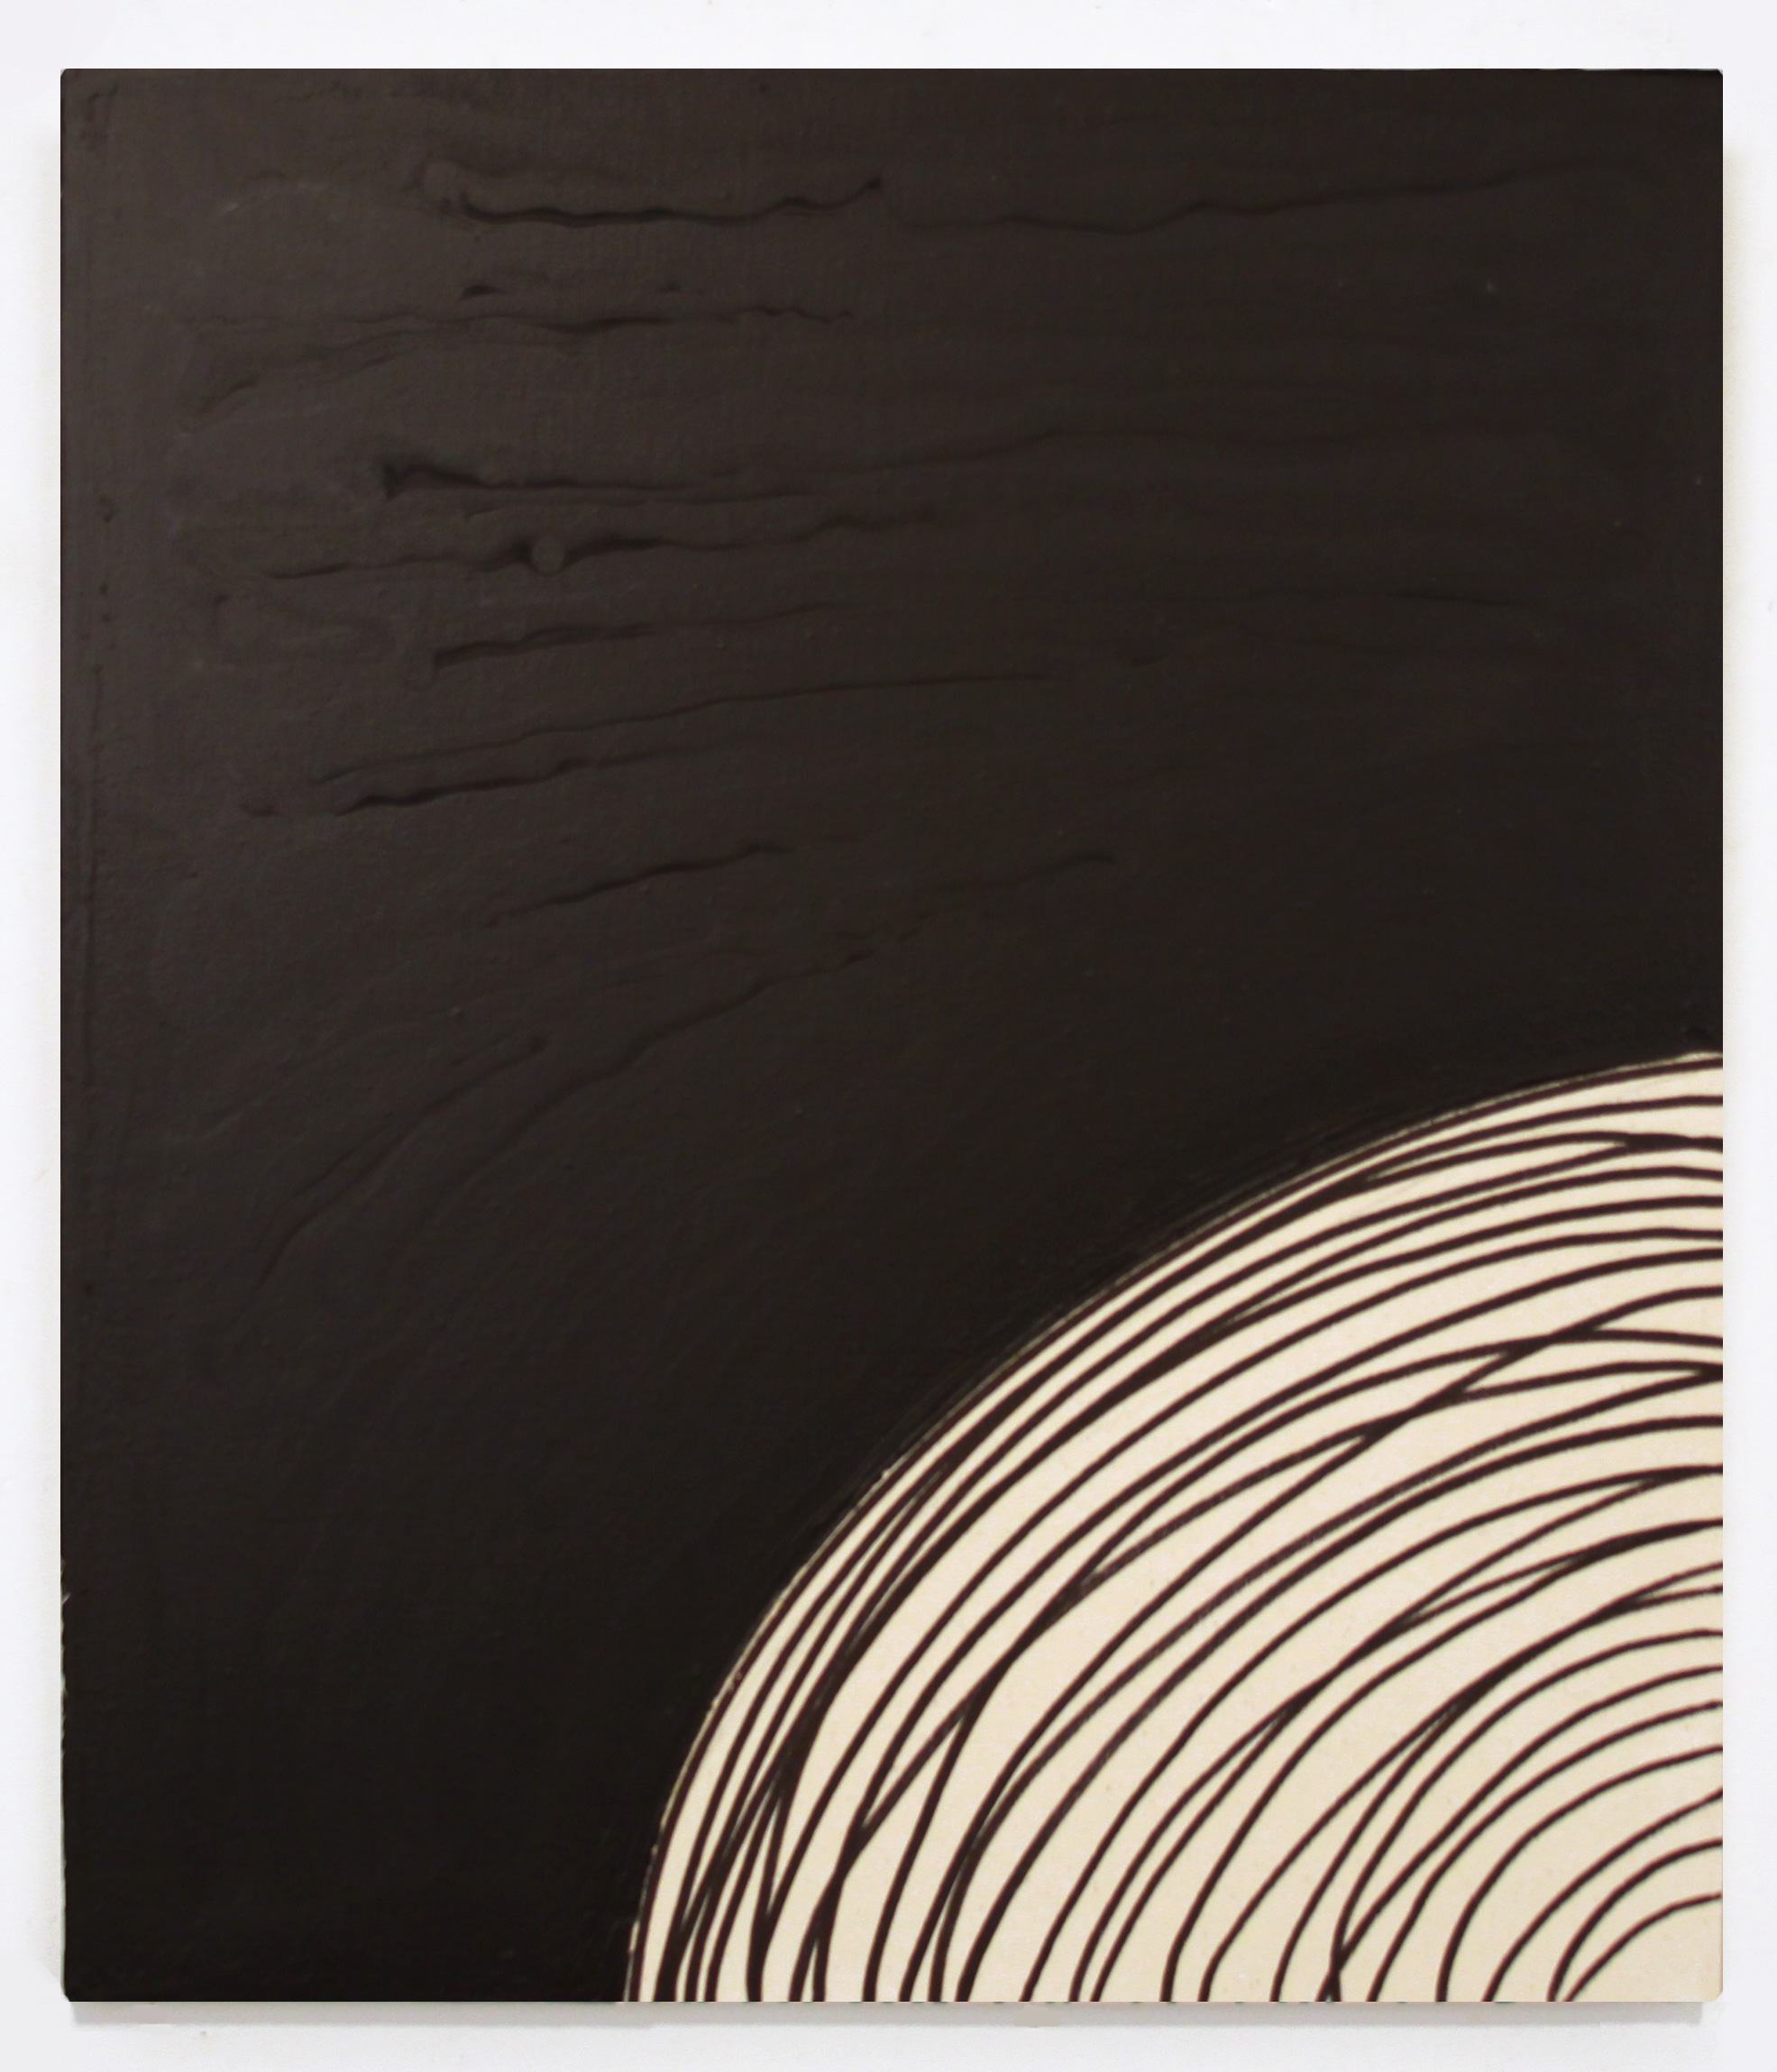 K_Black_Painting_2012_2010s_Gary_Kuehn